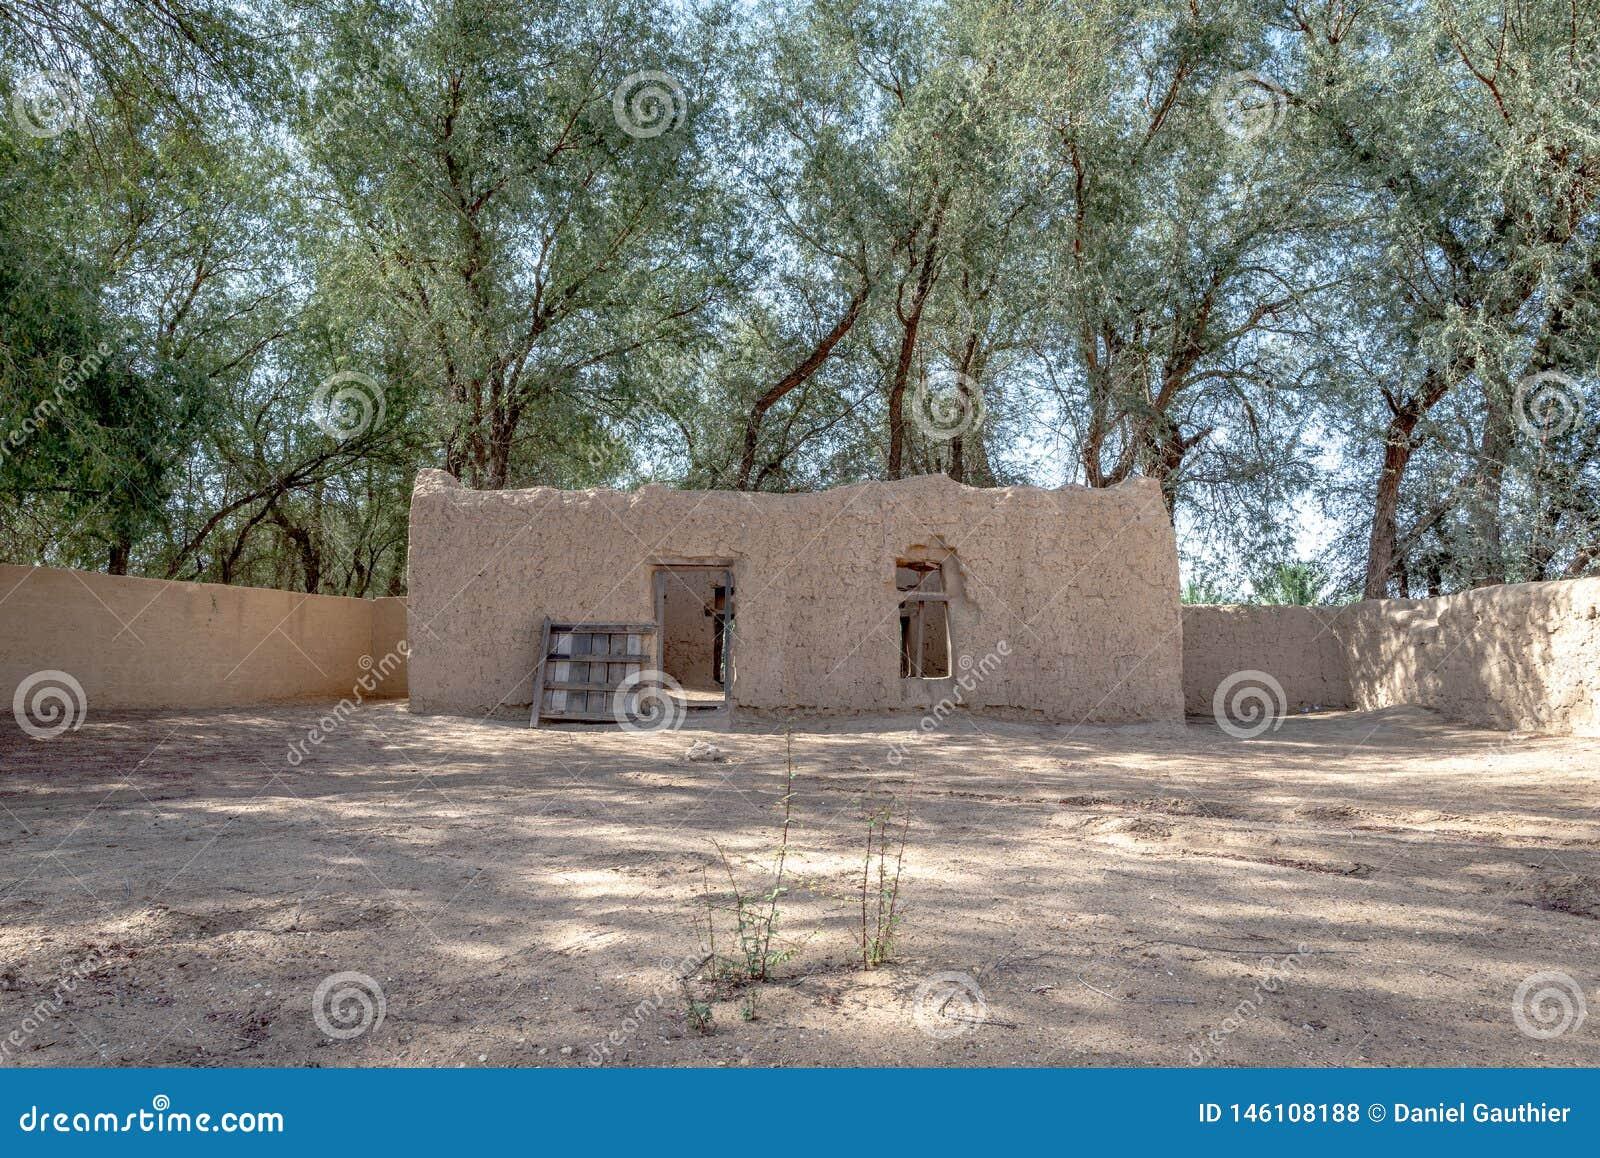 Daleki widok Al Dahiri dom w Al Qattara oazie, Al Ain